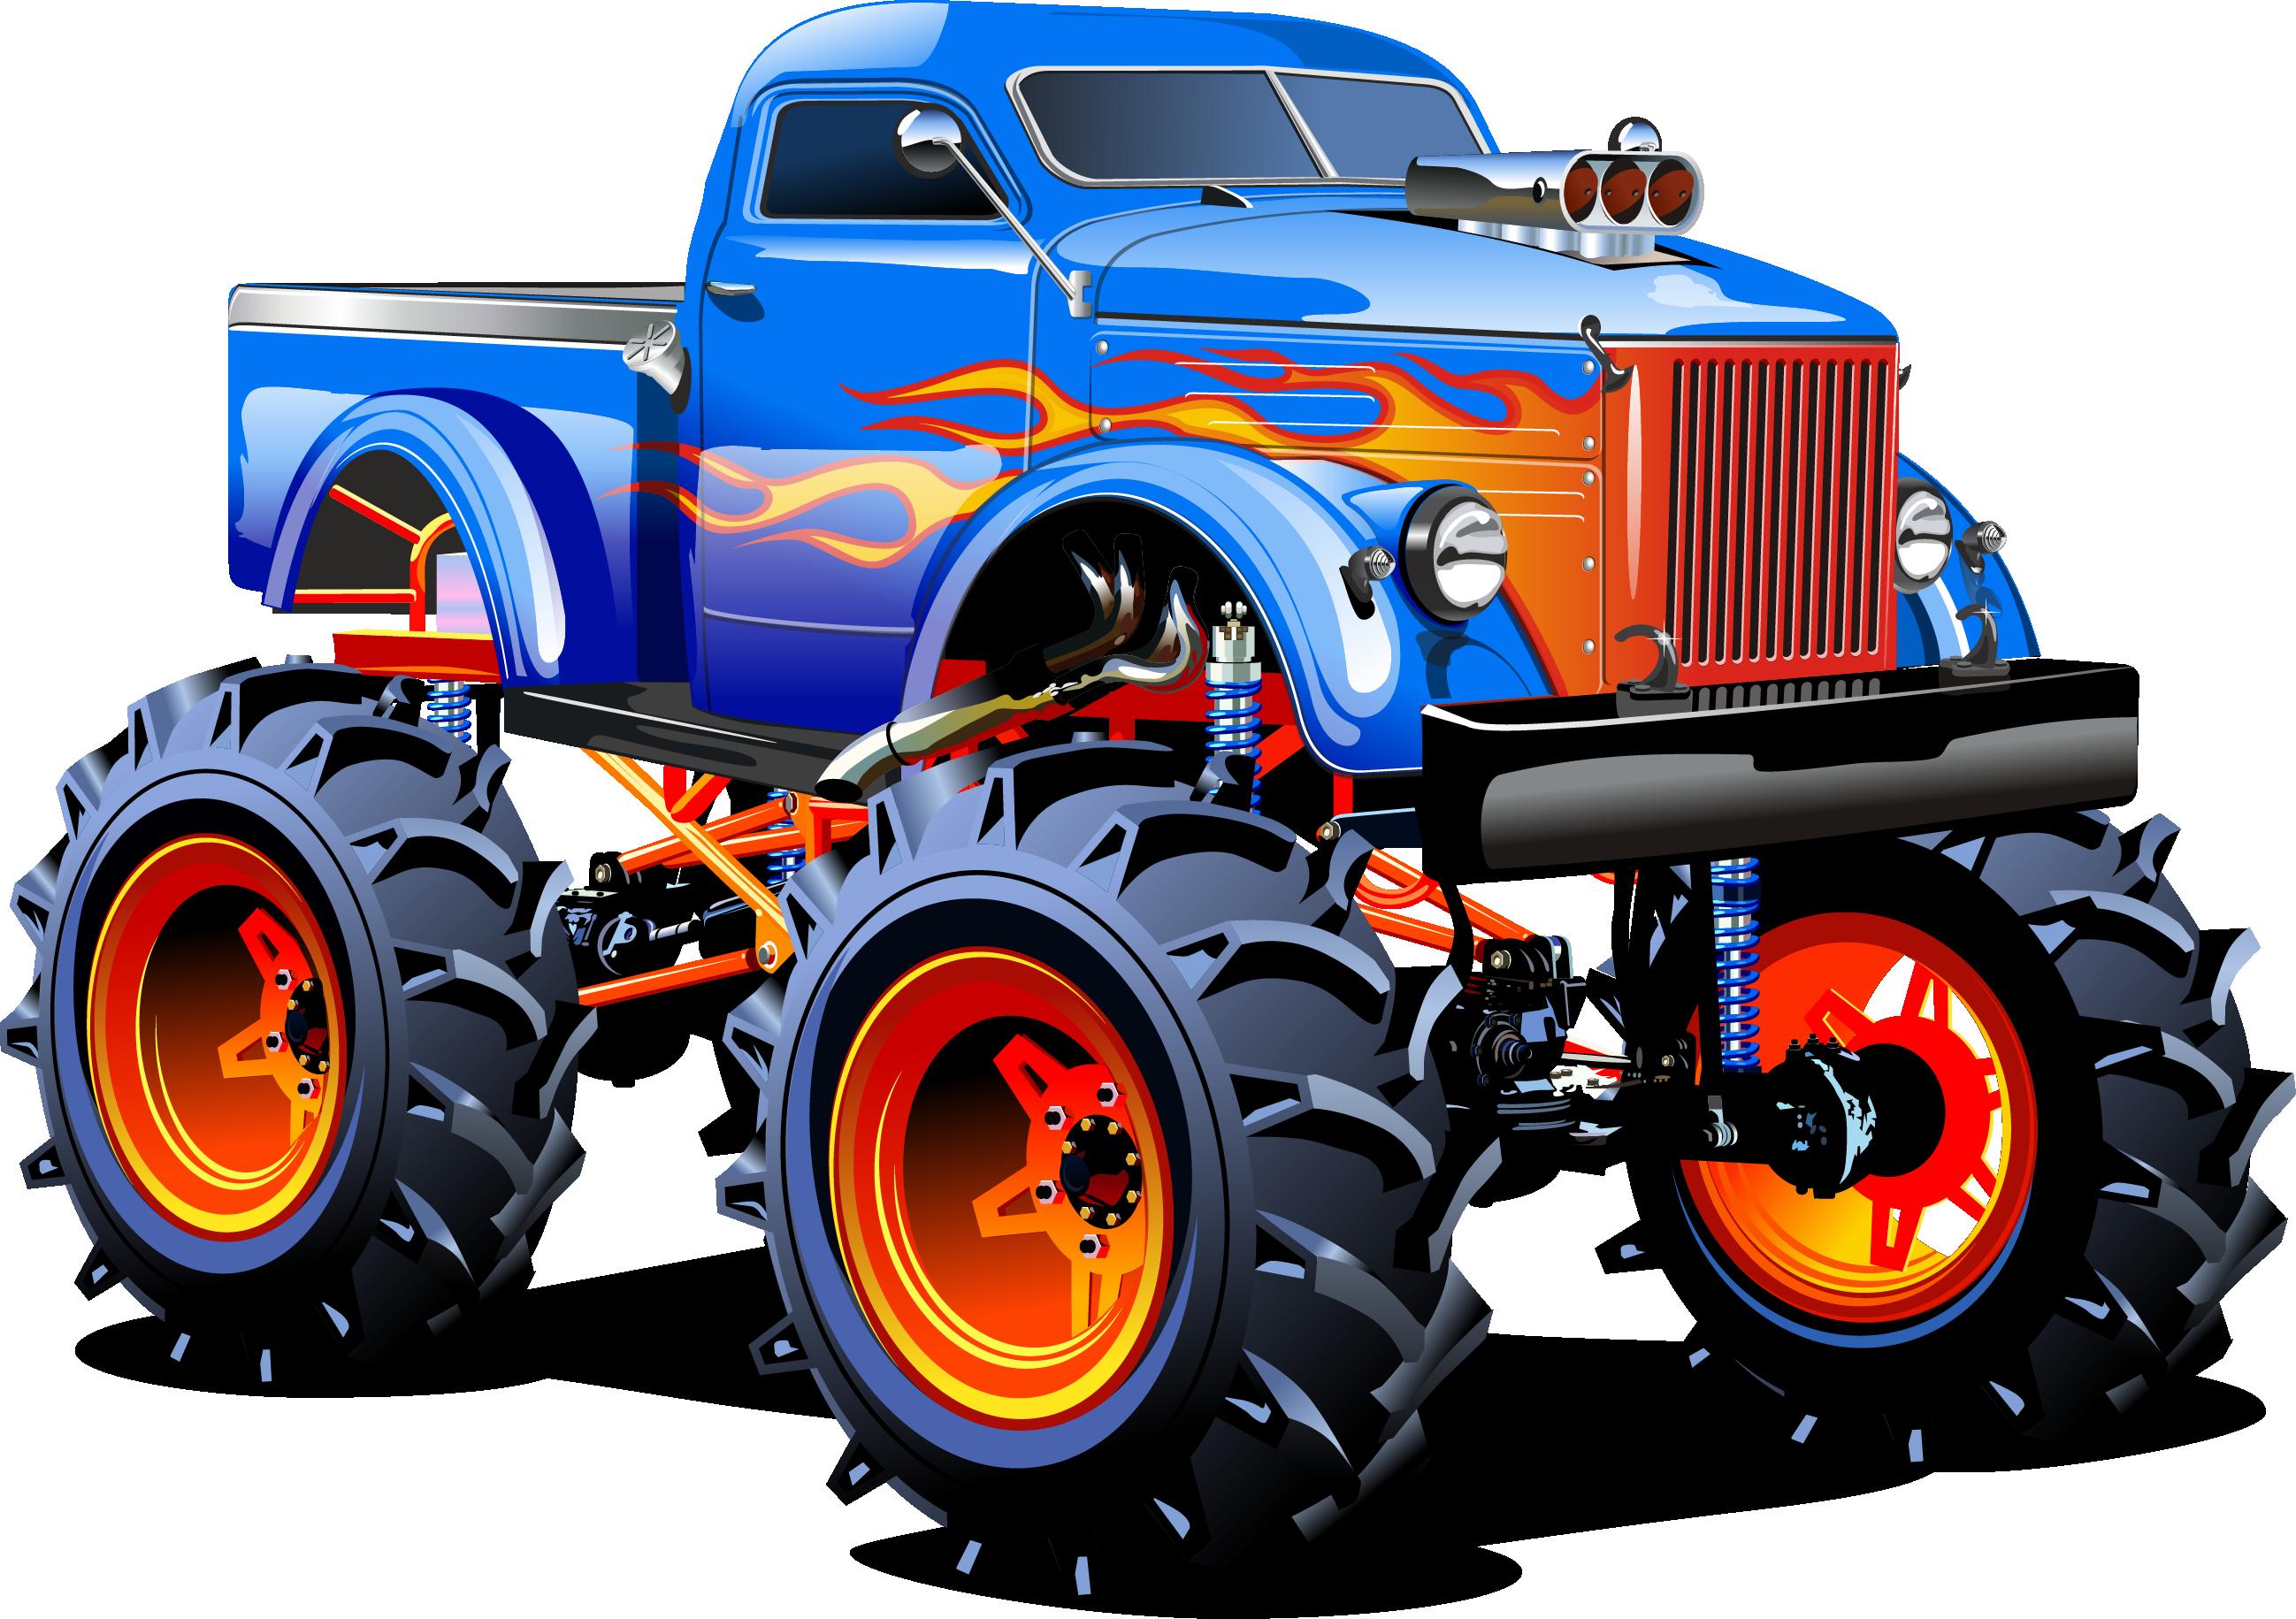 Car Monster truck Stock photography